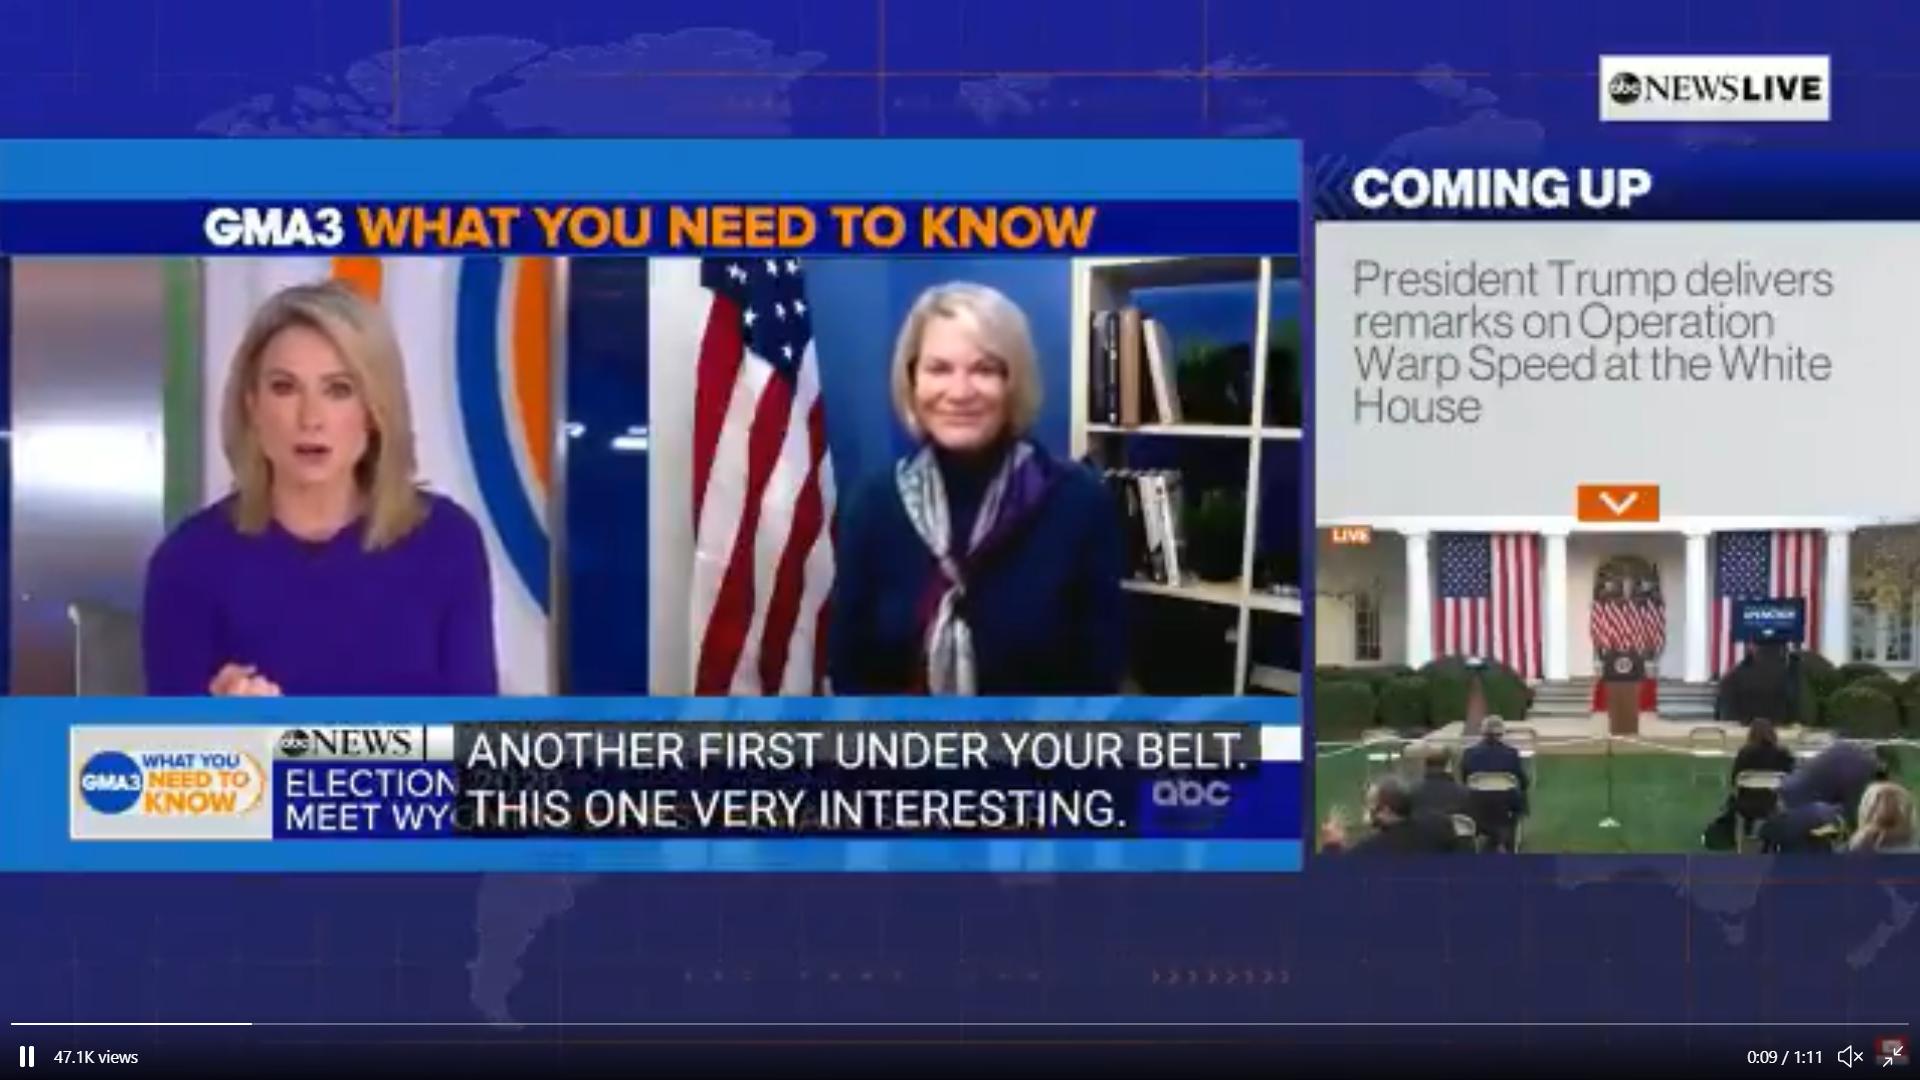 Cynthia Lummis talks Bitcoin on ABC News. Source: ABC News Live, Bitcoinization